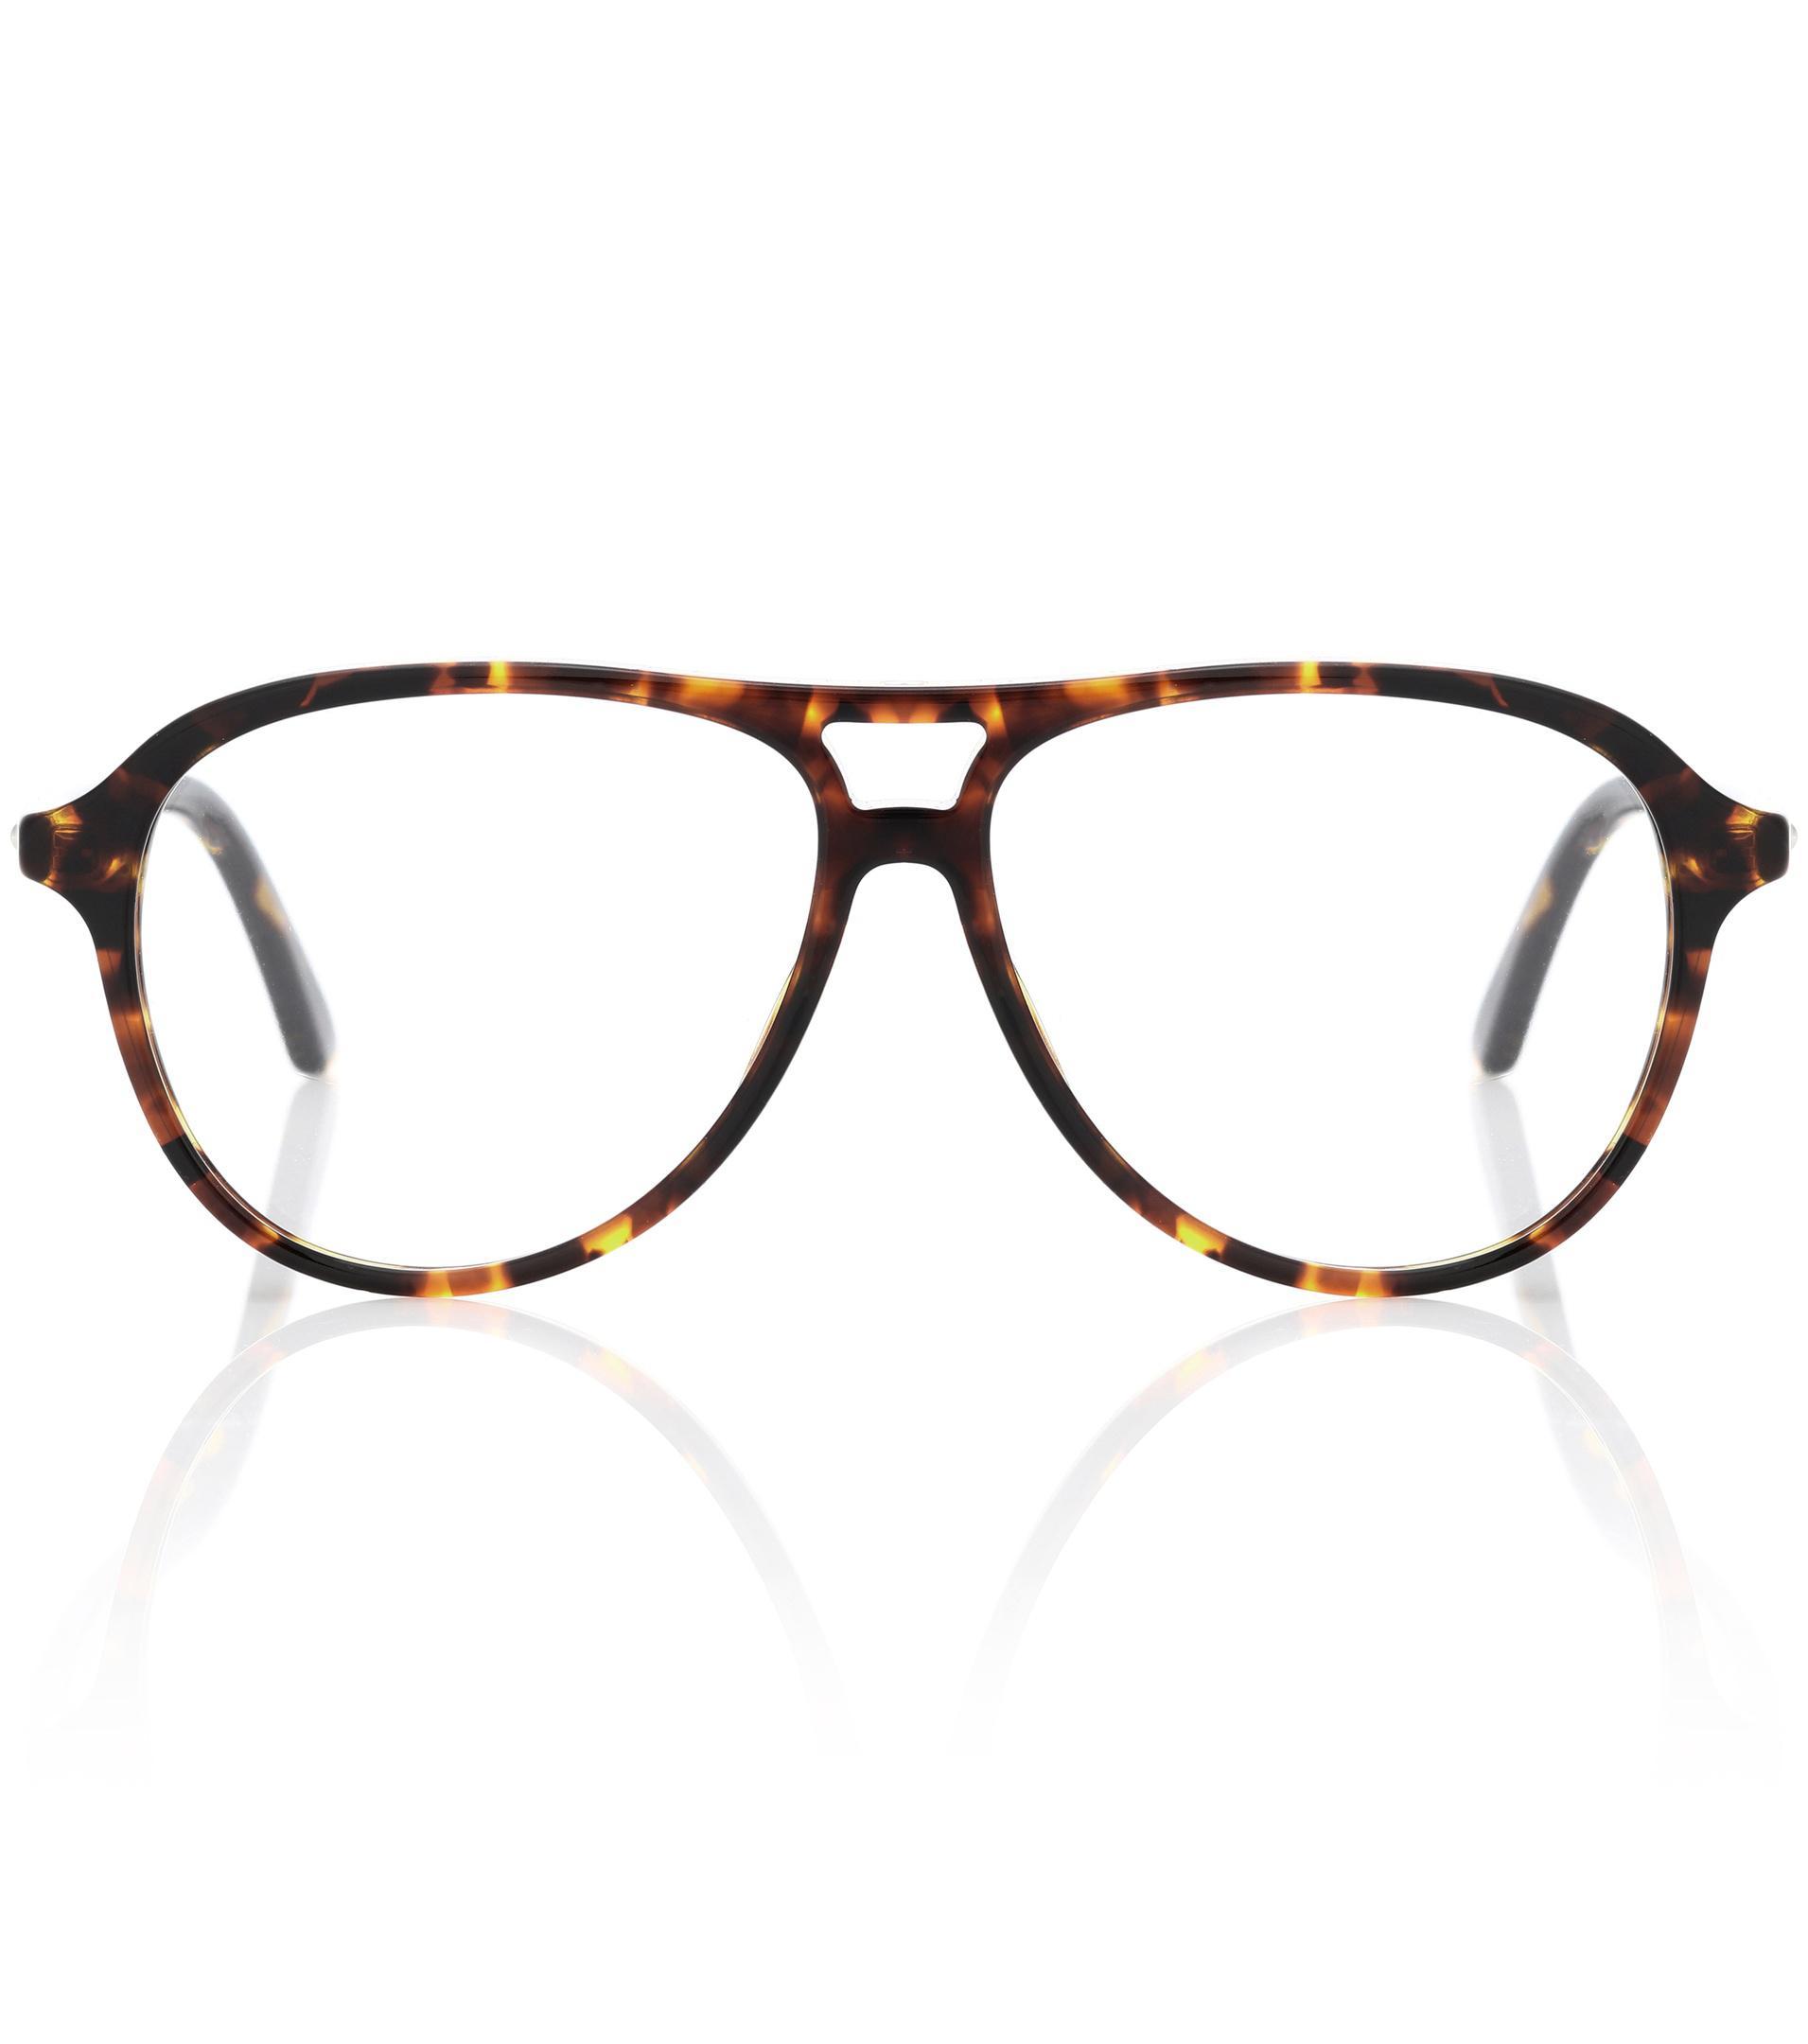 64689c46375 Lyst - Dior Montaigne52 Glasses in Brown